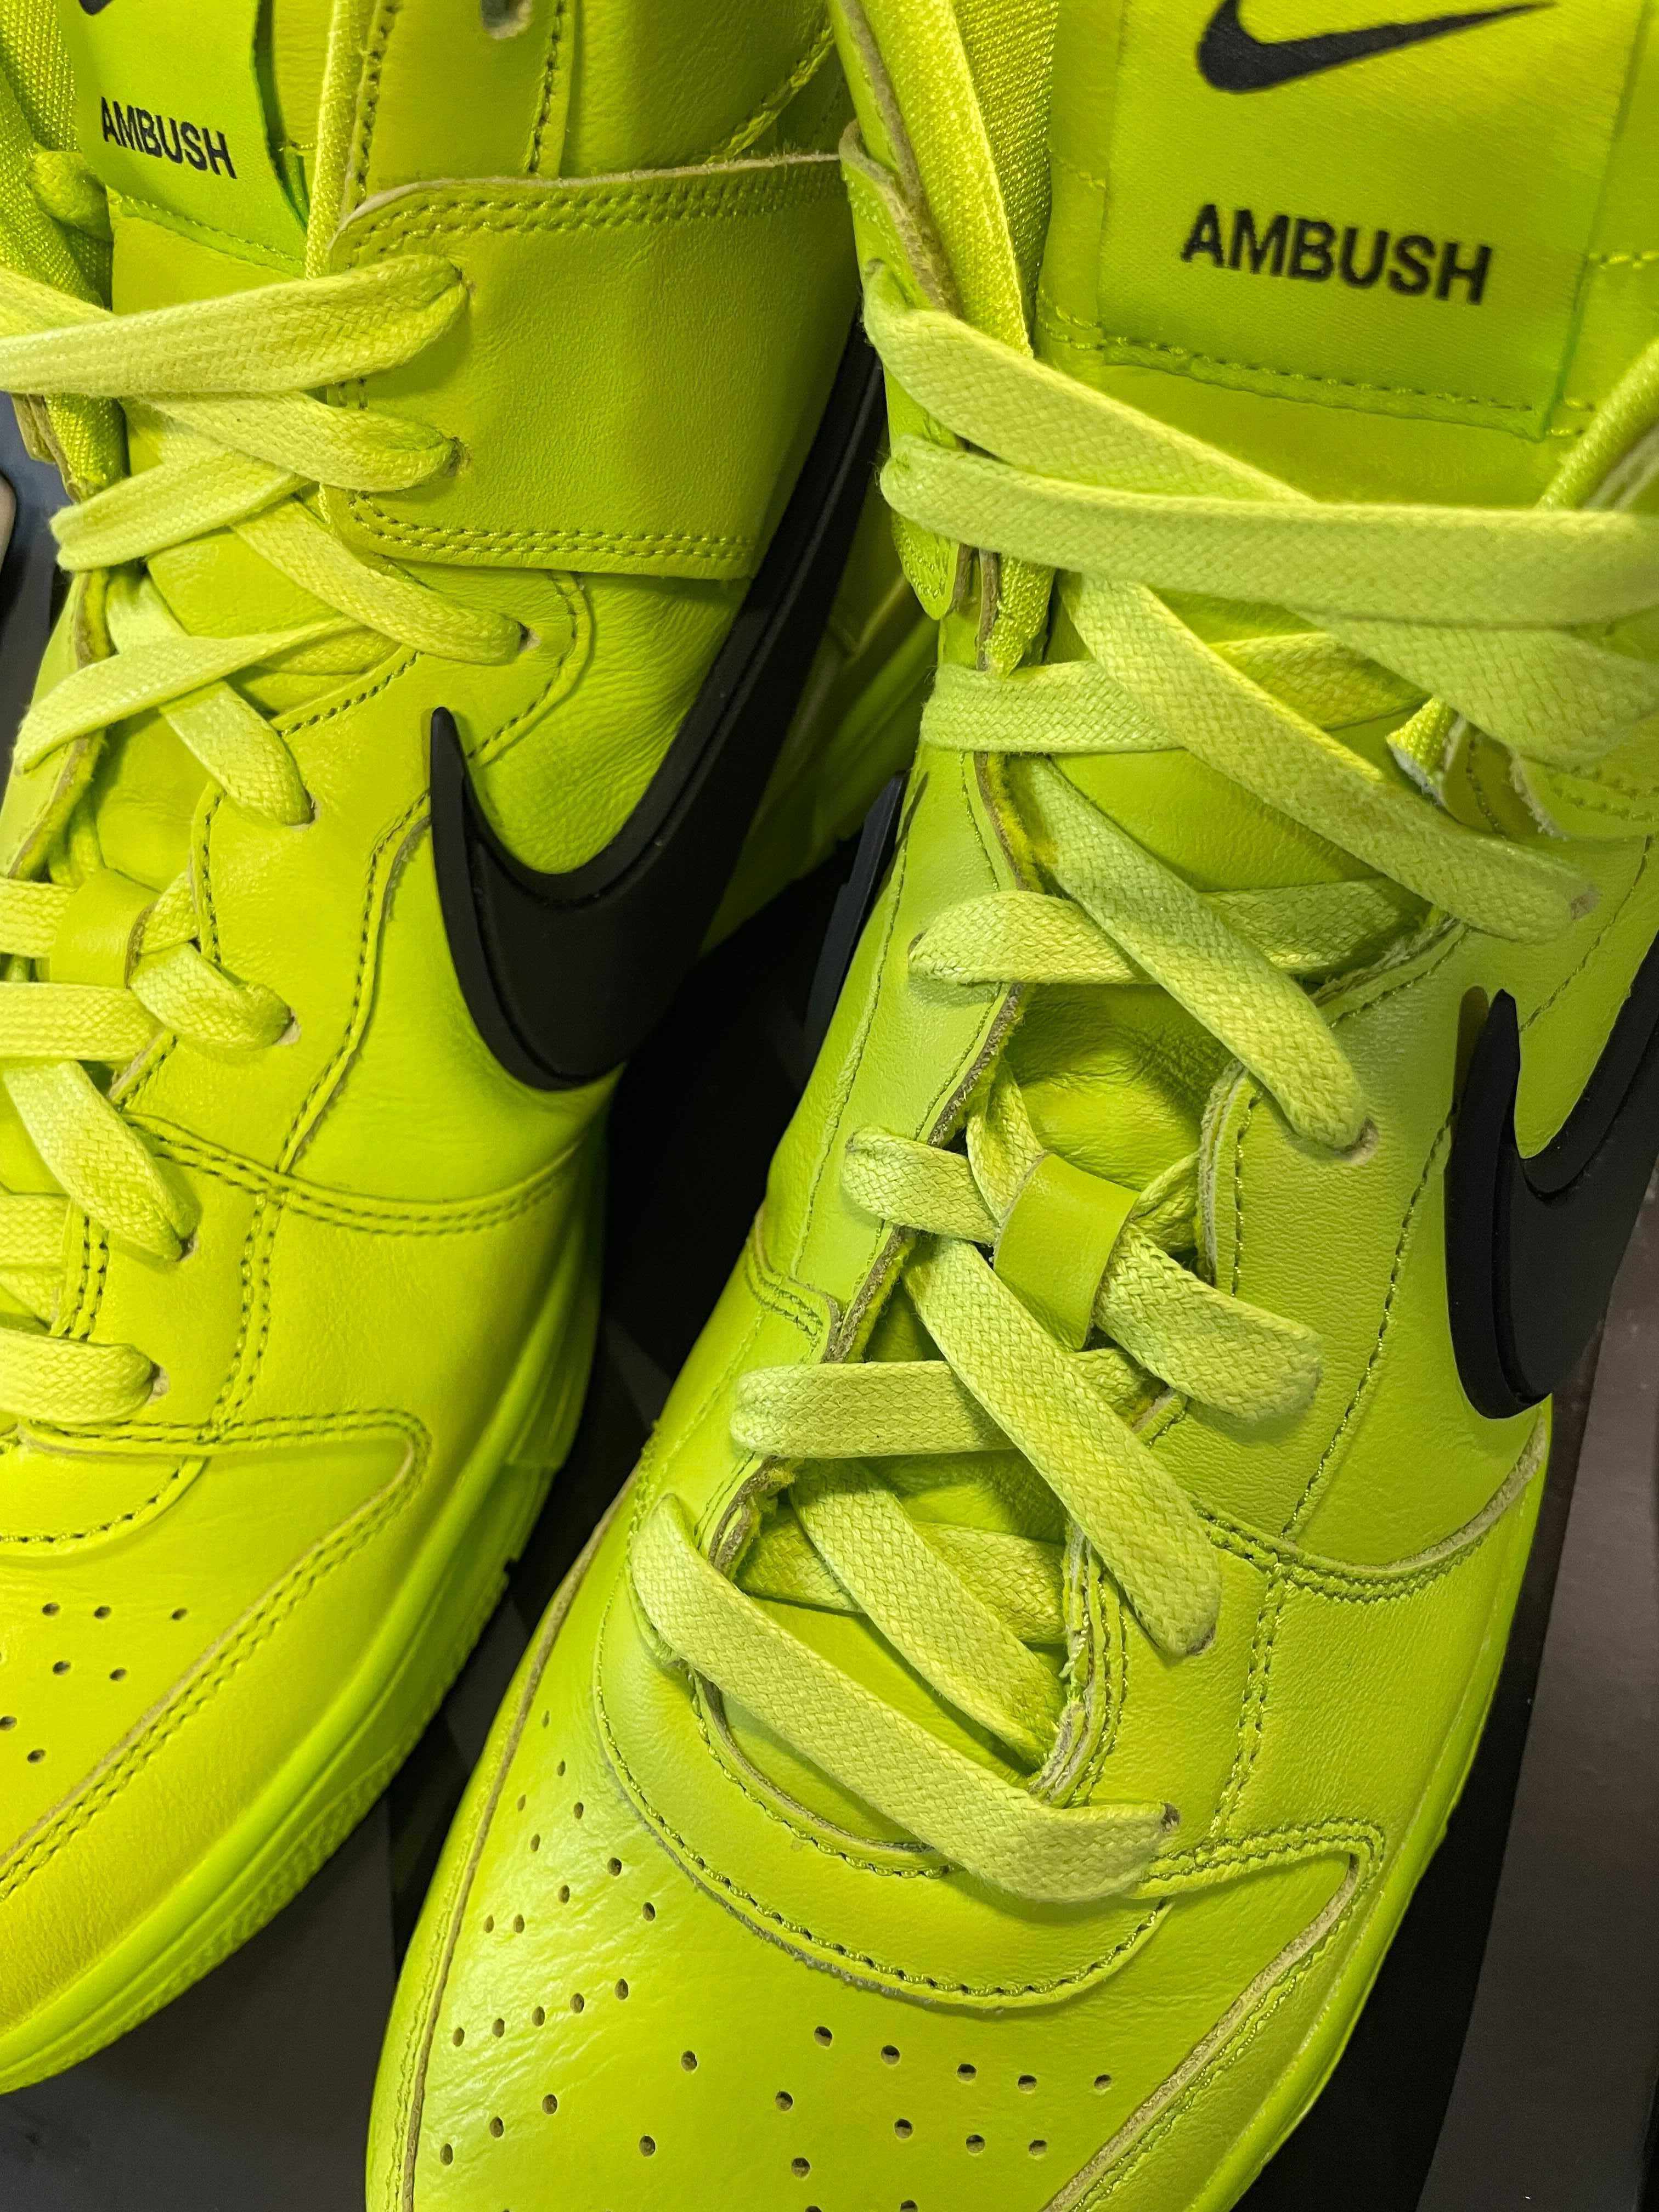 Ambush x Nike Dunk High 'Atomic Green' CU7544-300 Front